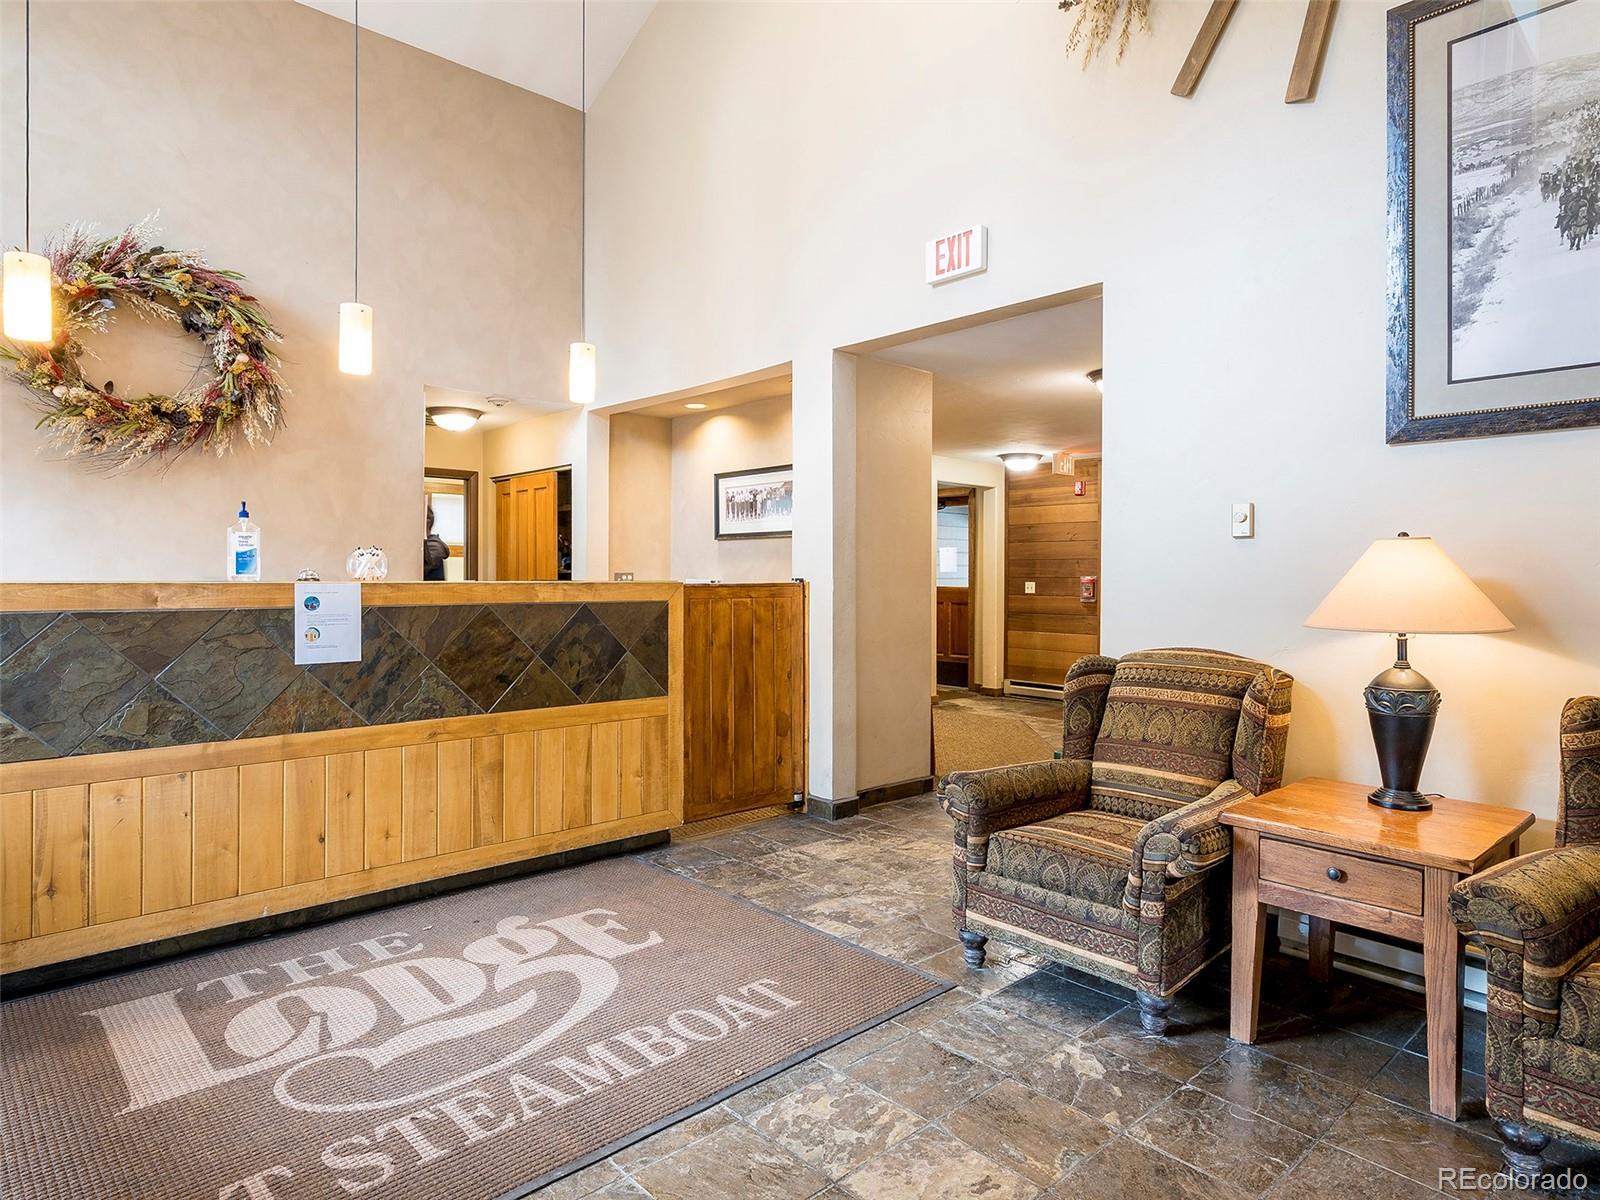 MLS# 4193338 - 17 - 2700 Village Drive #D-204, Steamboat Springs, CO 80487